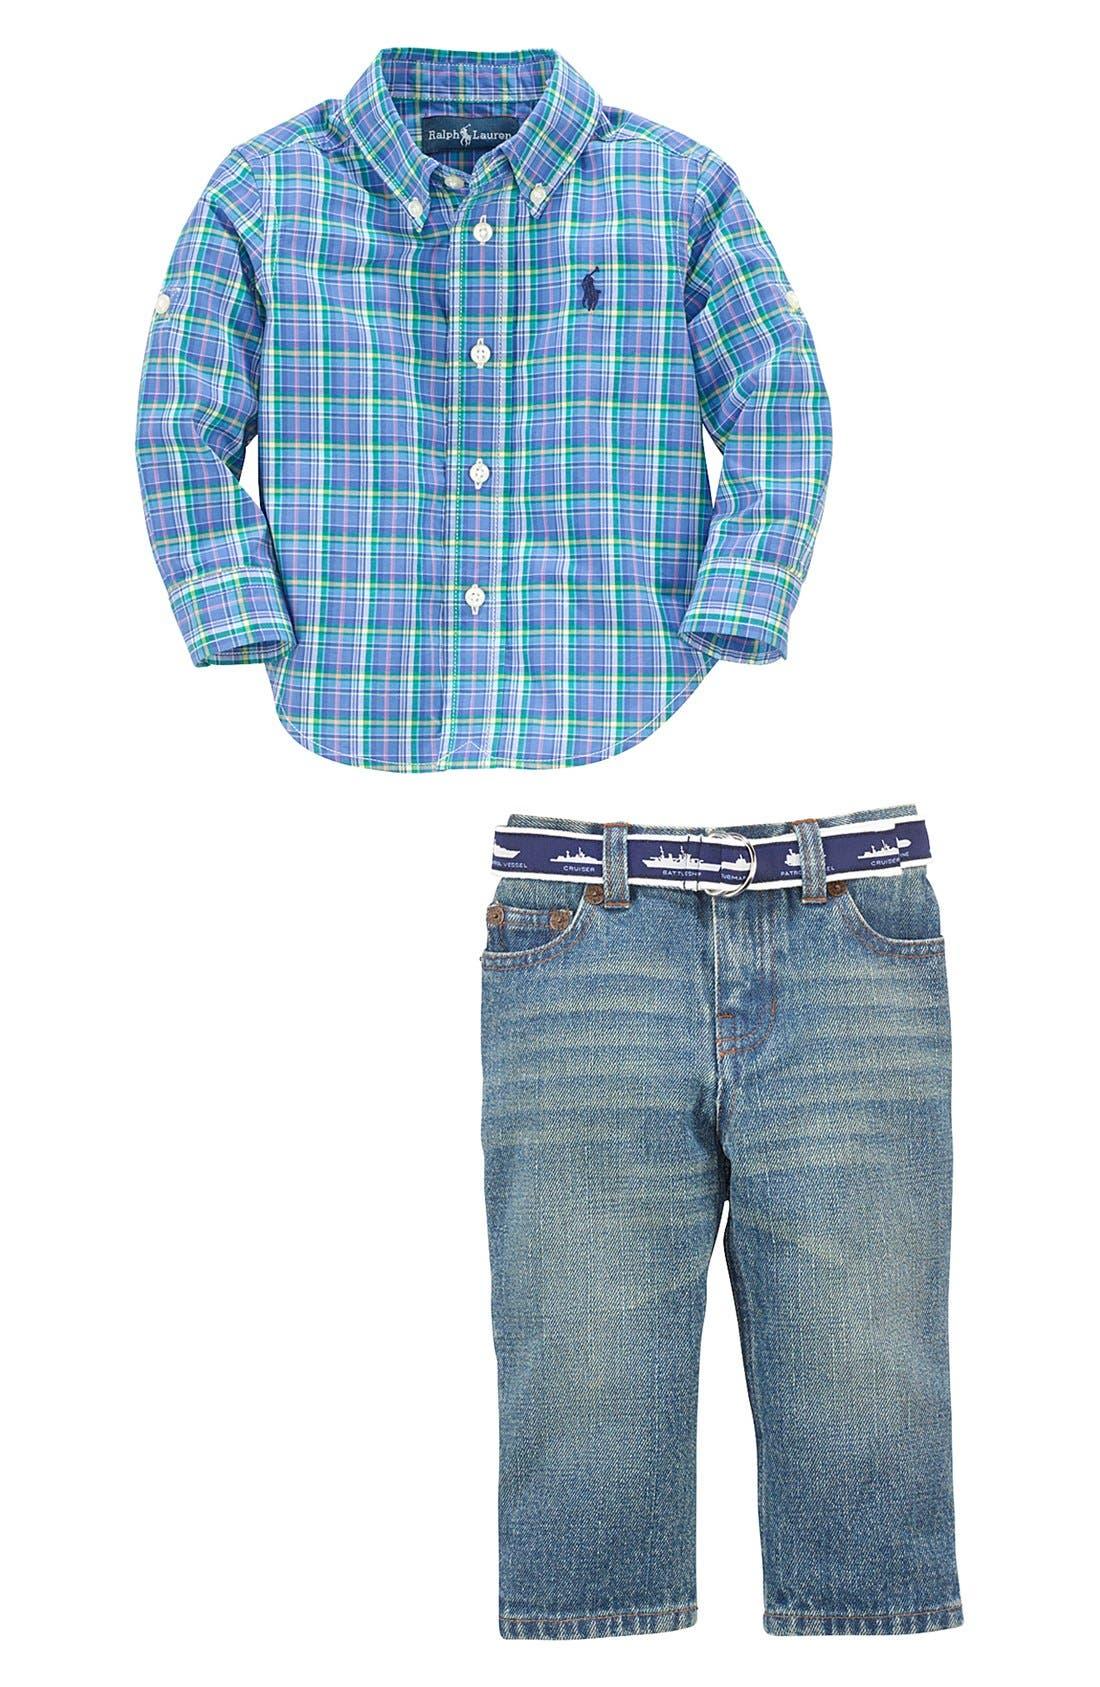 Alternate Image 3  - Ralph Lauren Plaid Sport Shirt & Jeans (Baby Boys)